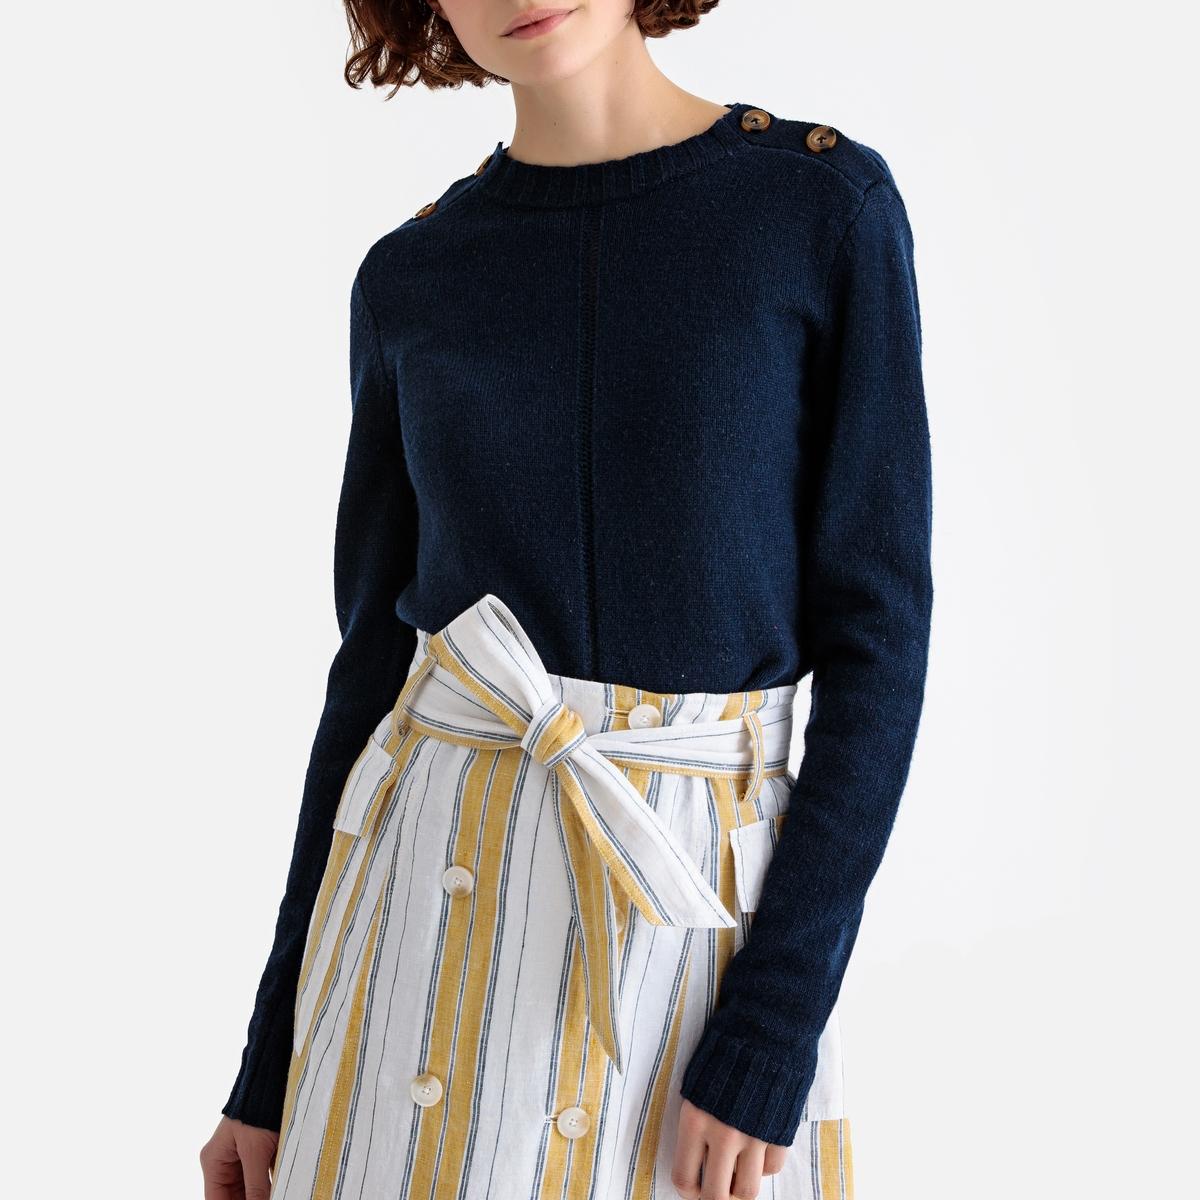 Jersey de lana de cordero con cuello redondo abotonado